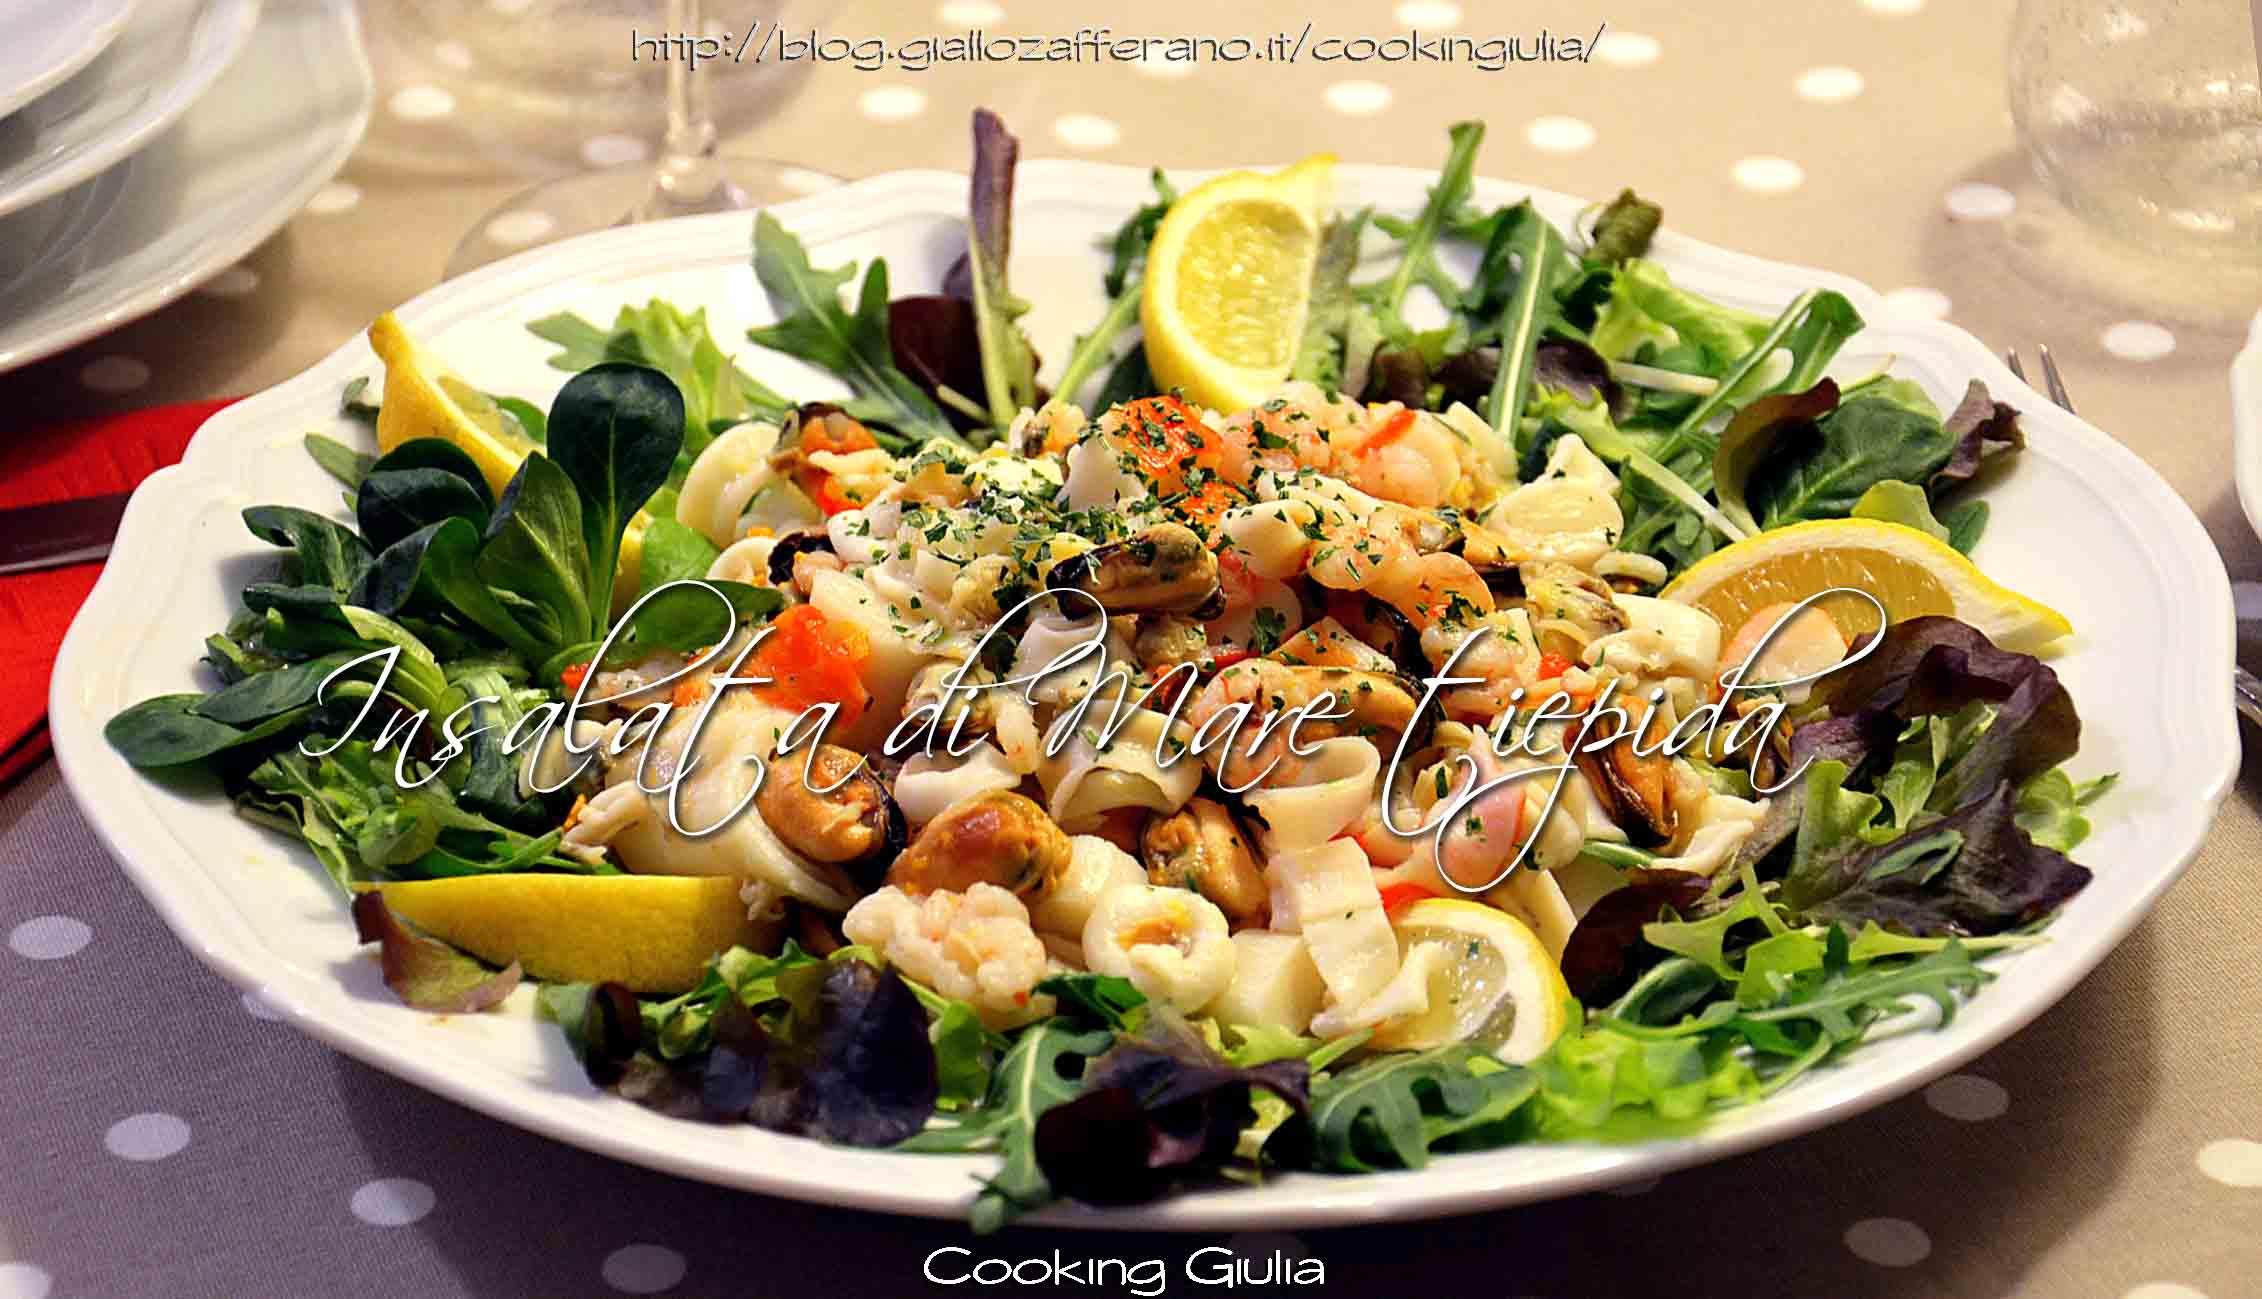 insalata di mare tiepida ricetta antipasto antipasto pesce